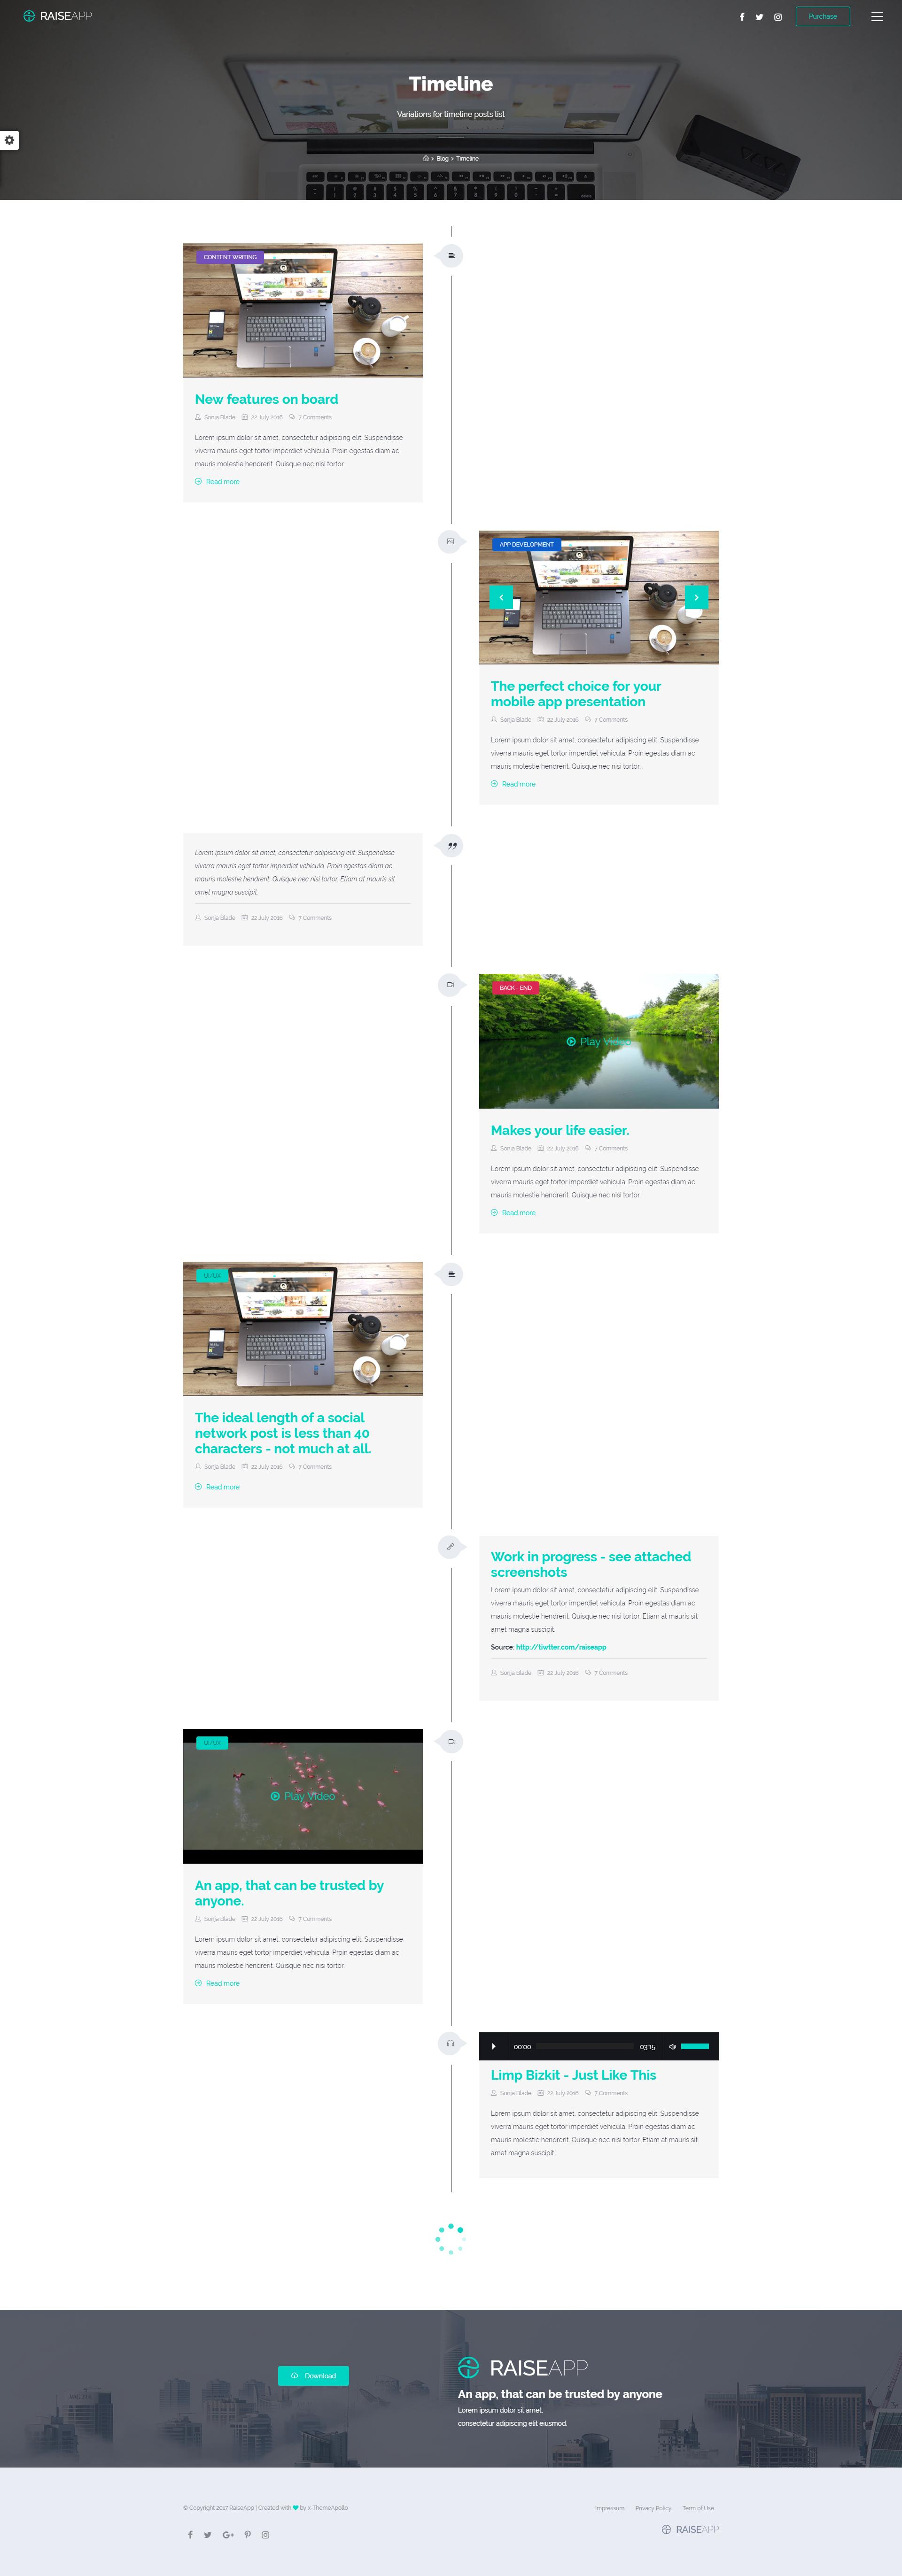 Timeline Website Template Resumes Ideas - Timeline website template